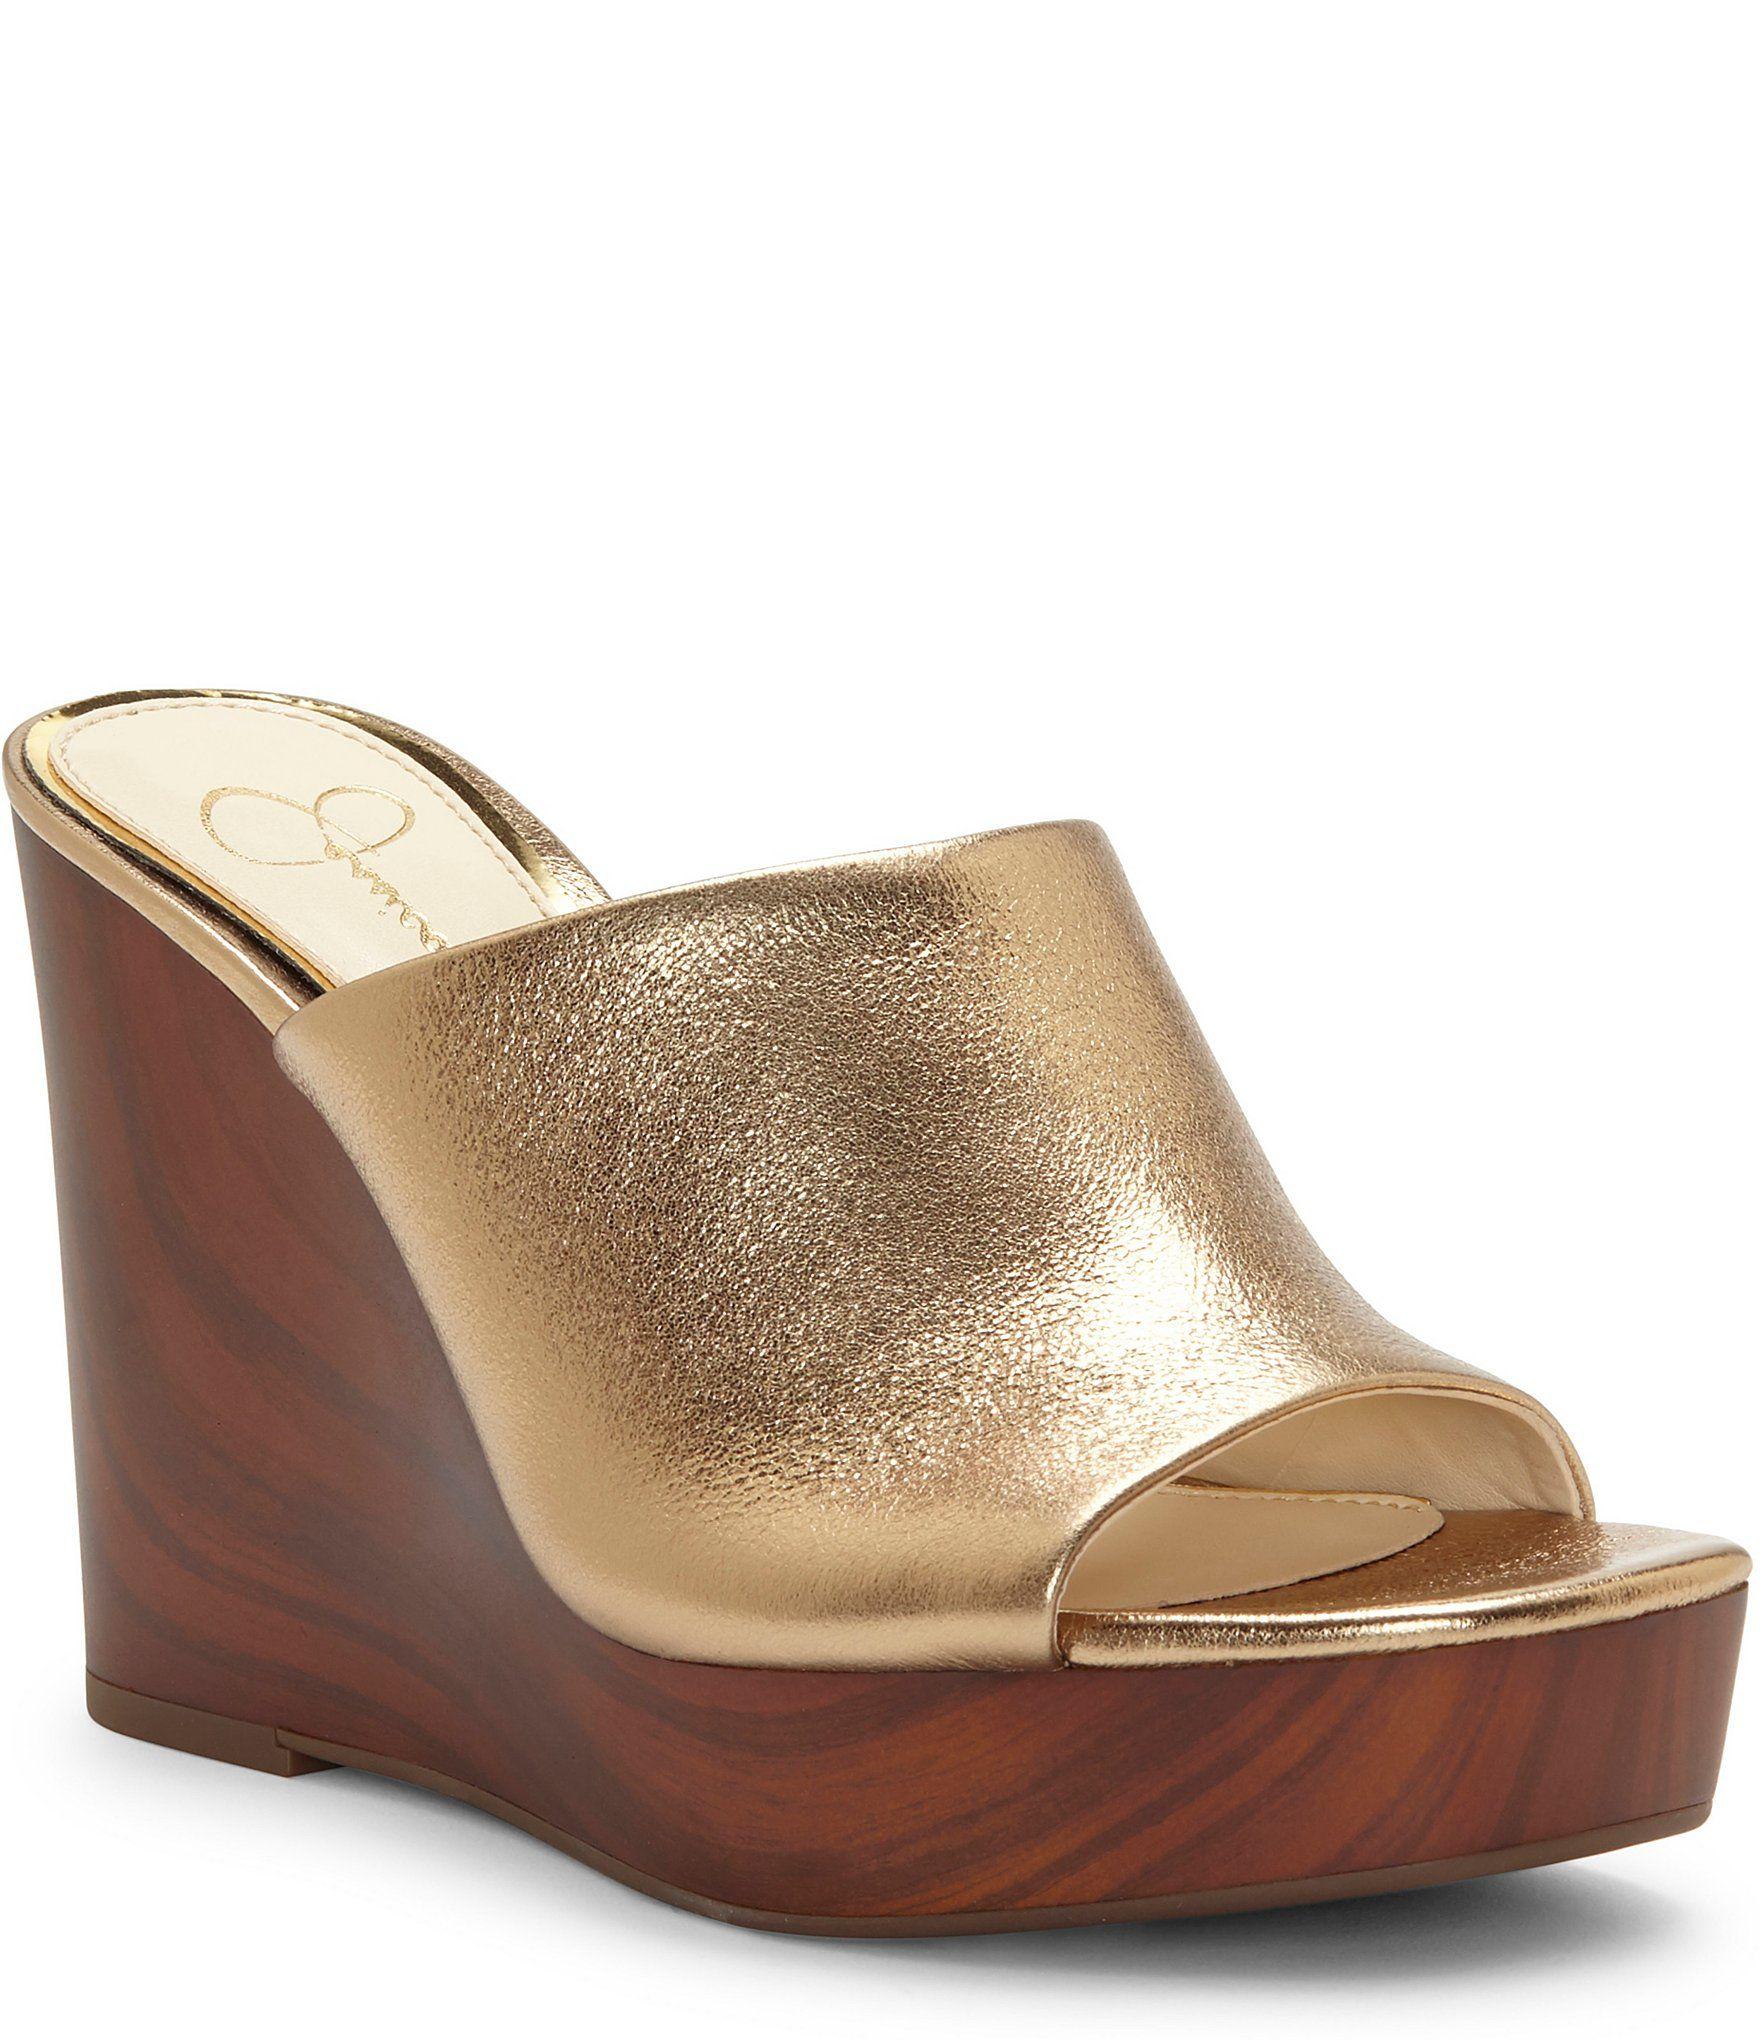 Jessica Simpson Shantelle Metallic Leather Square Toe Slide Wedges | Dillard's